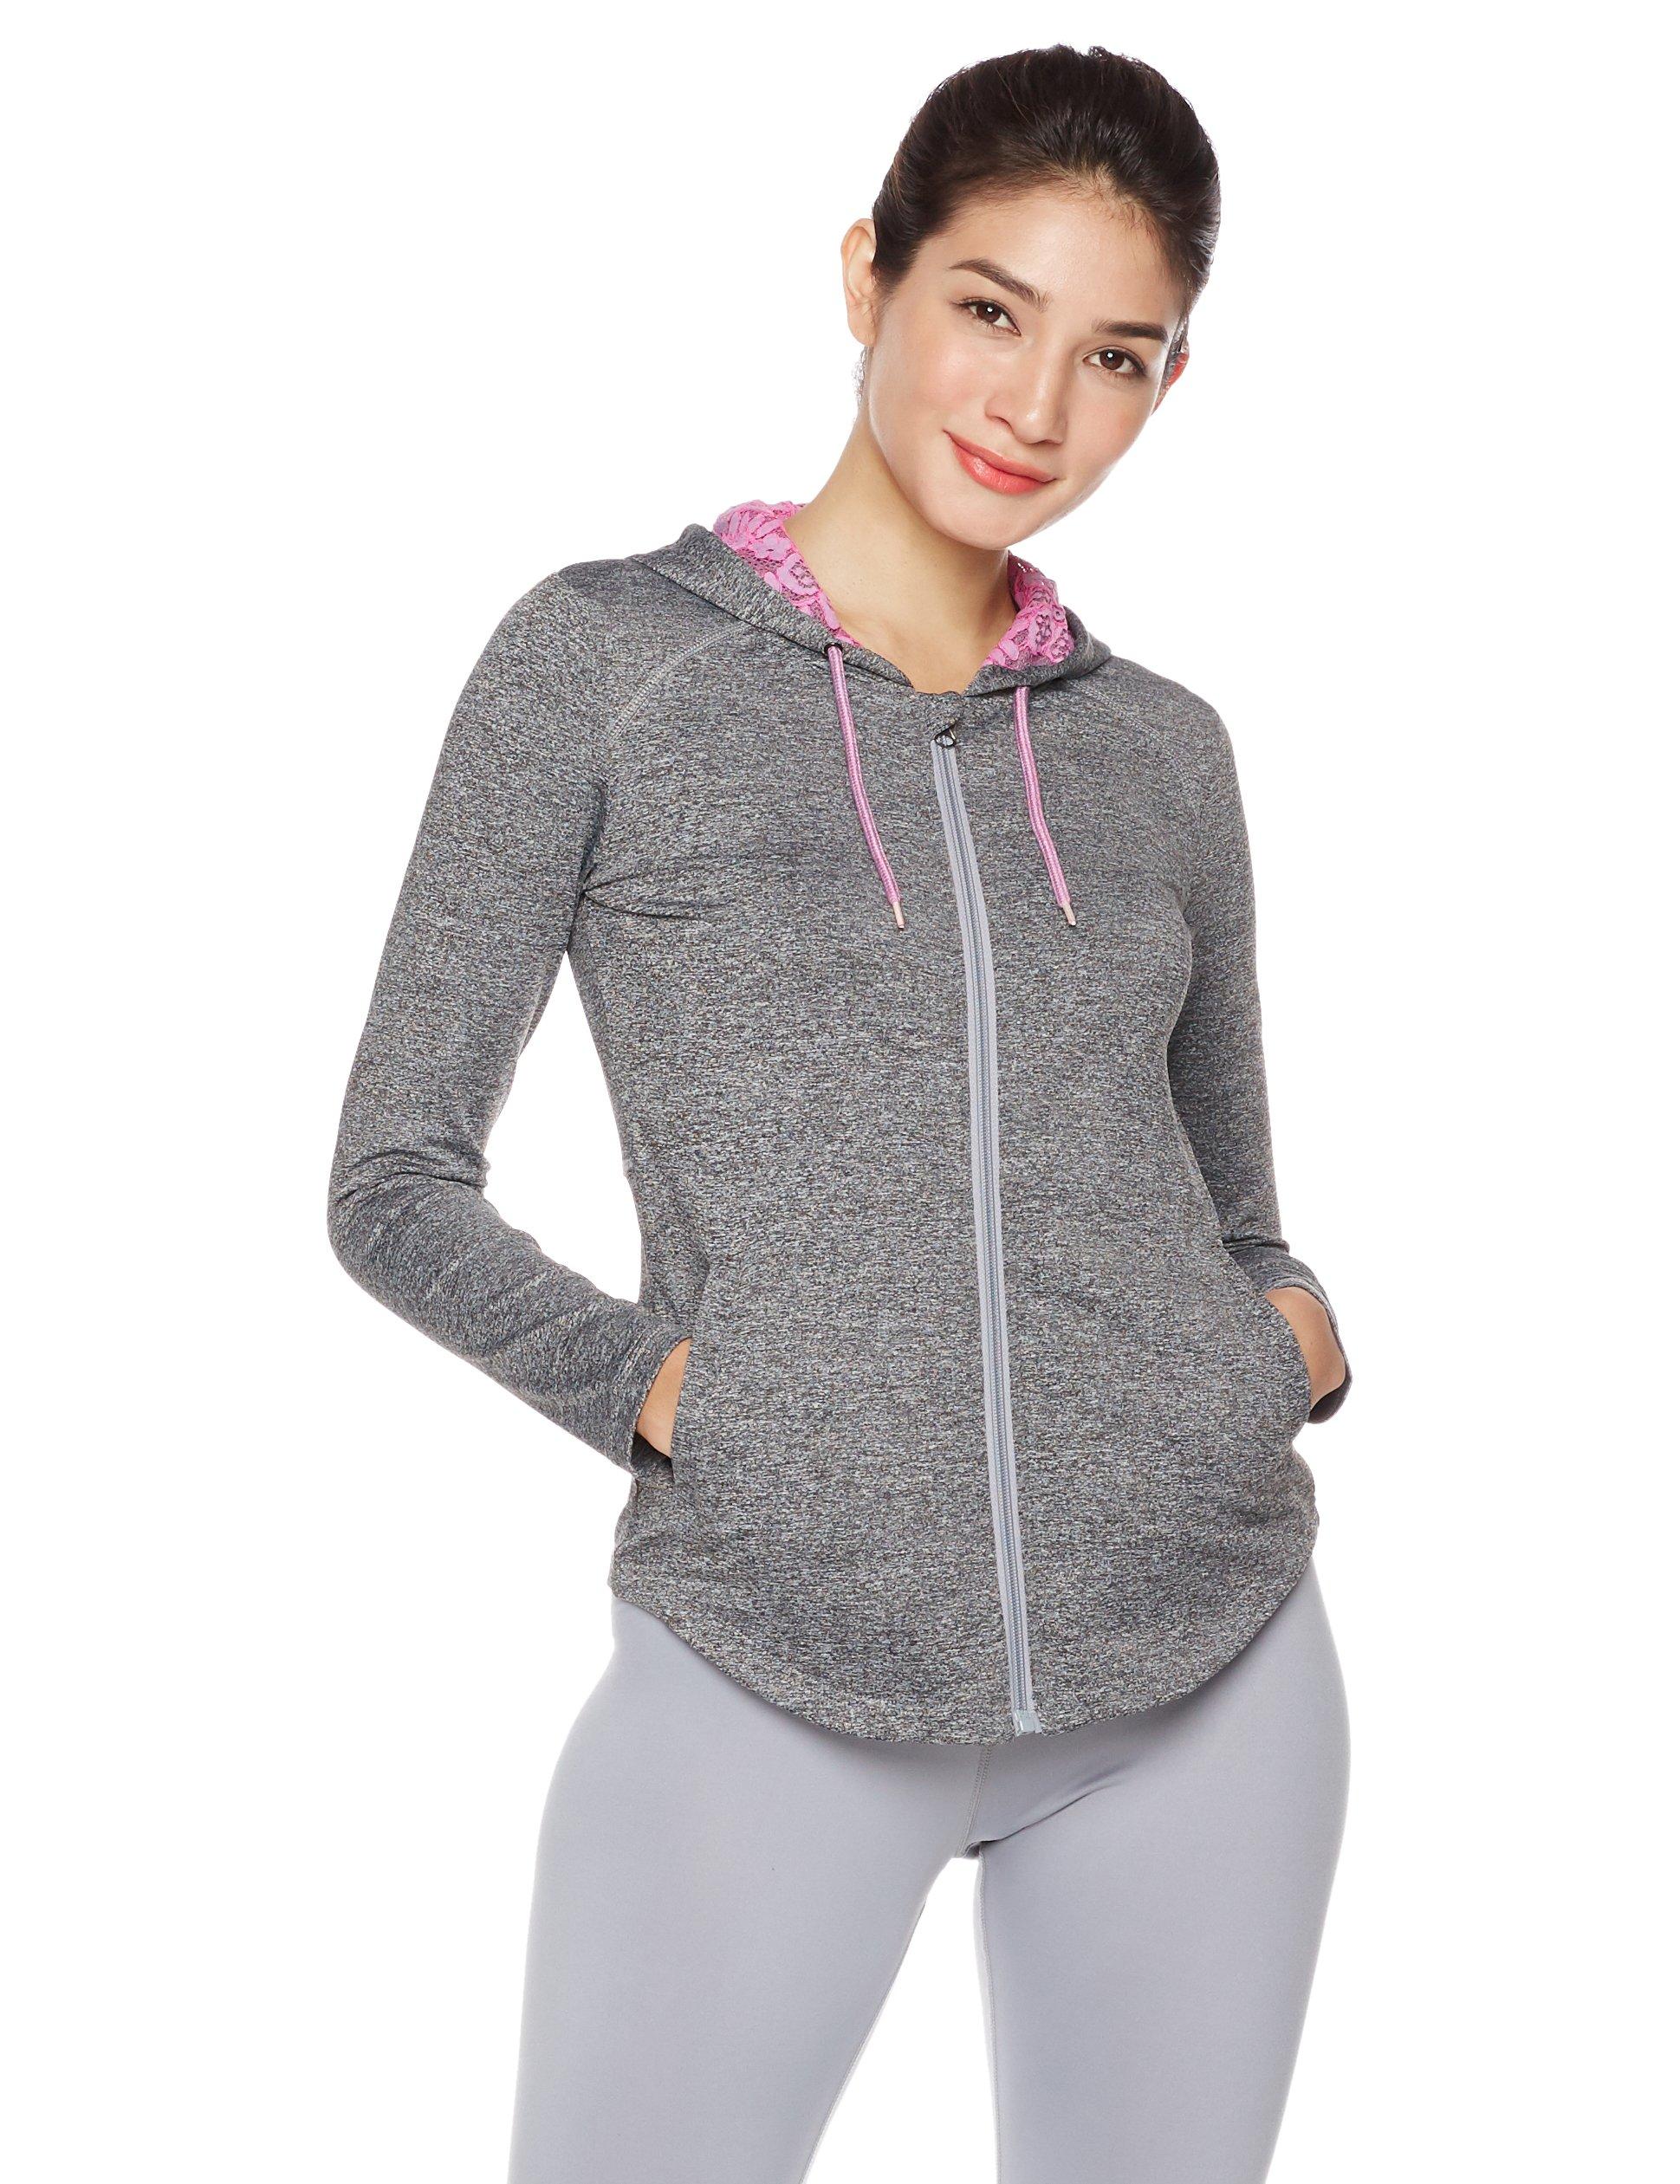 Mint Lilac Women's Performance Lightweight Full Zip Hoodie Small Dark Gray